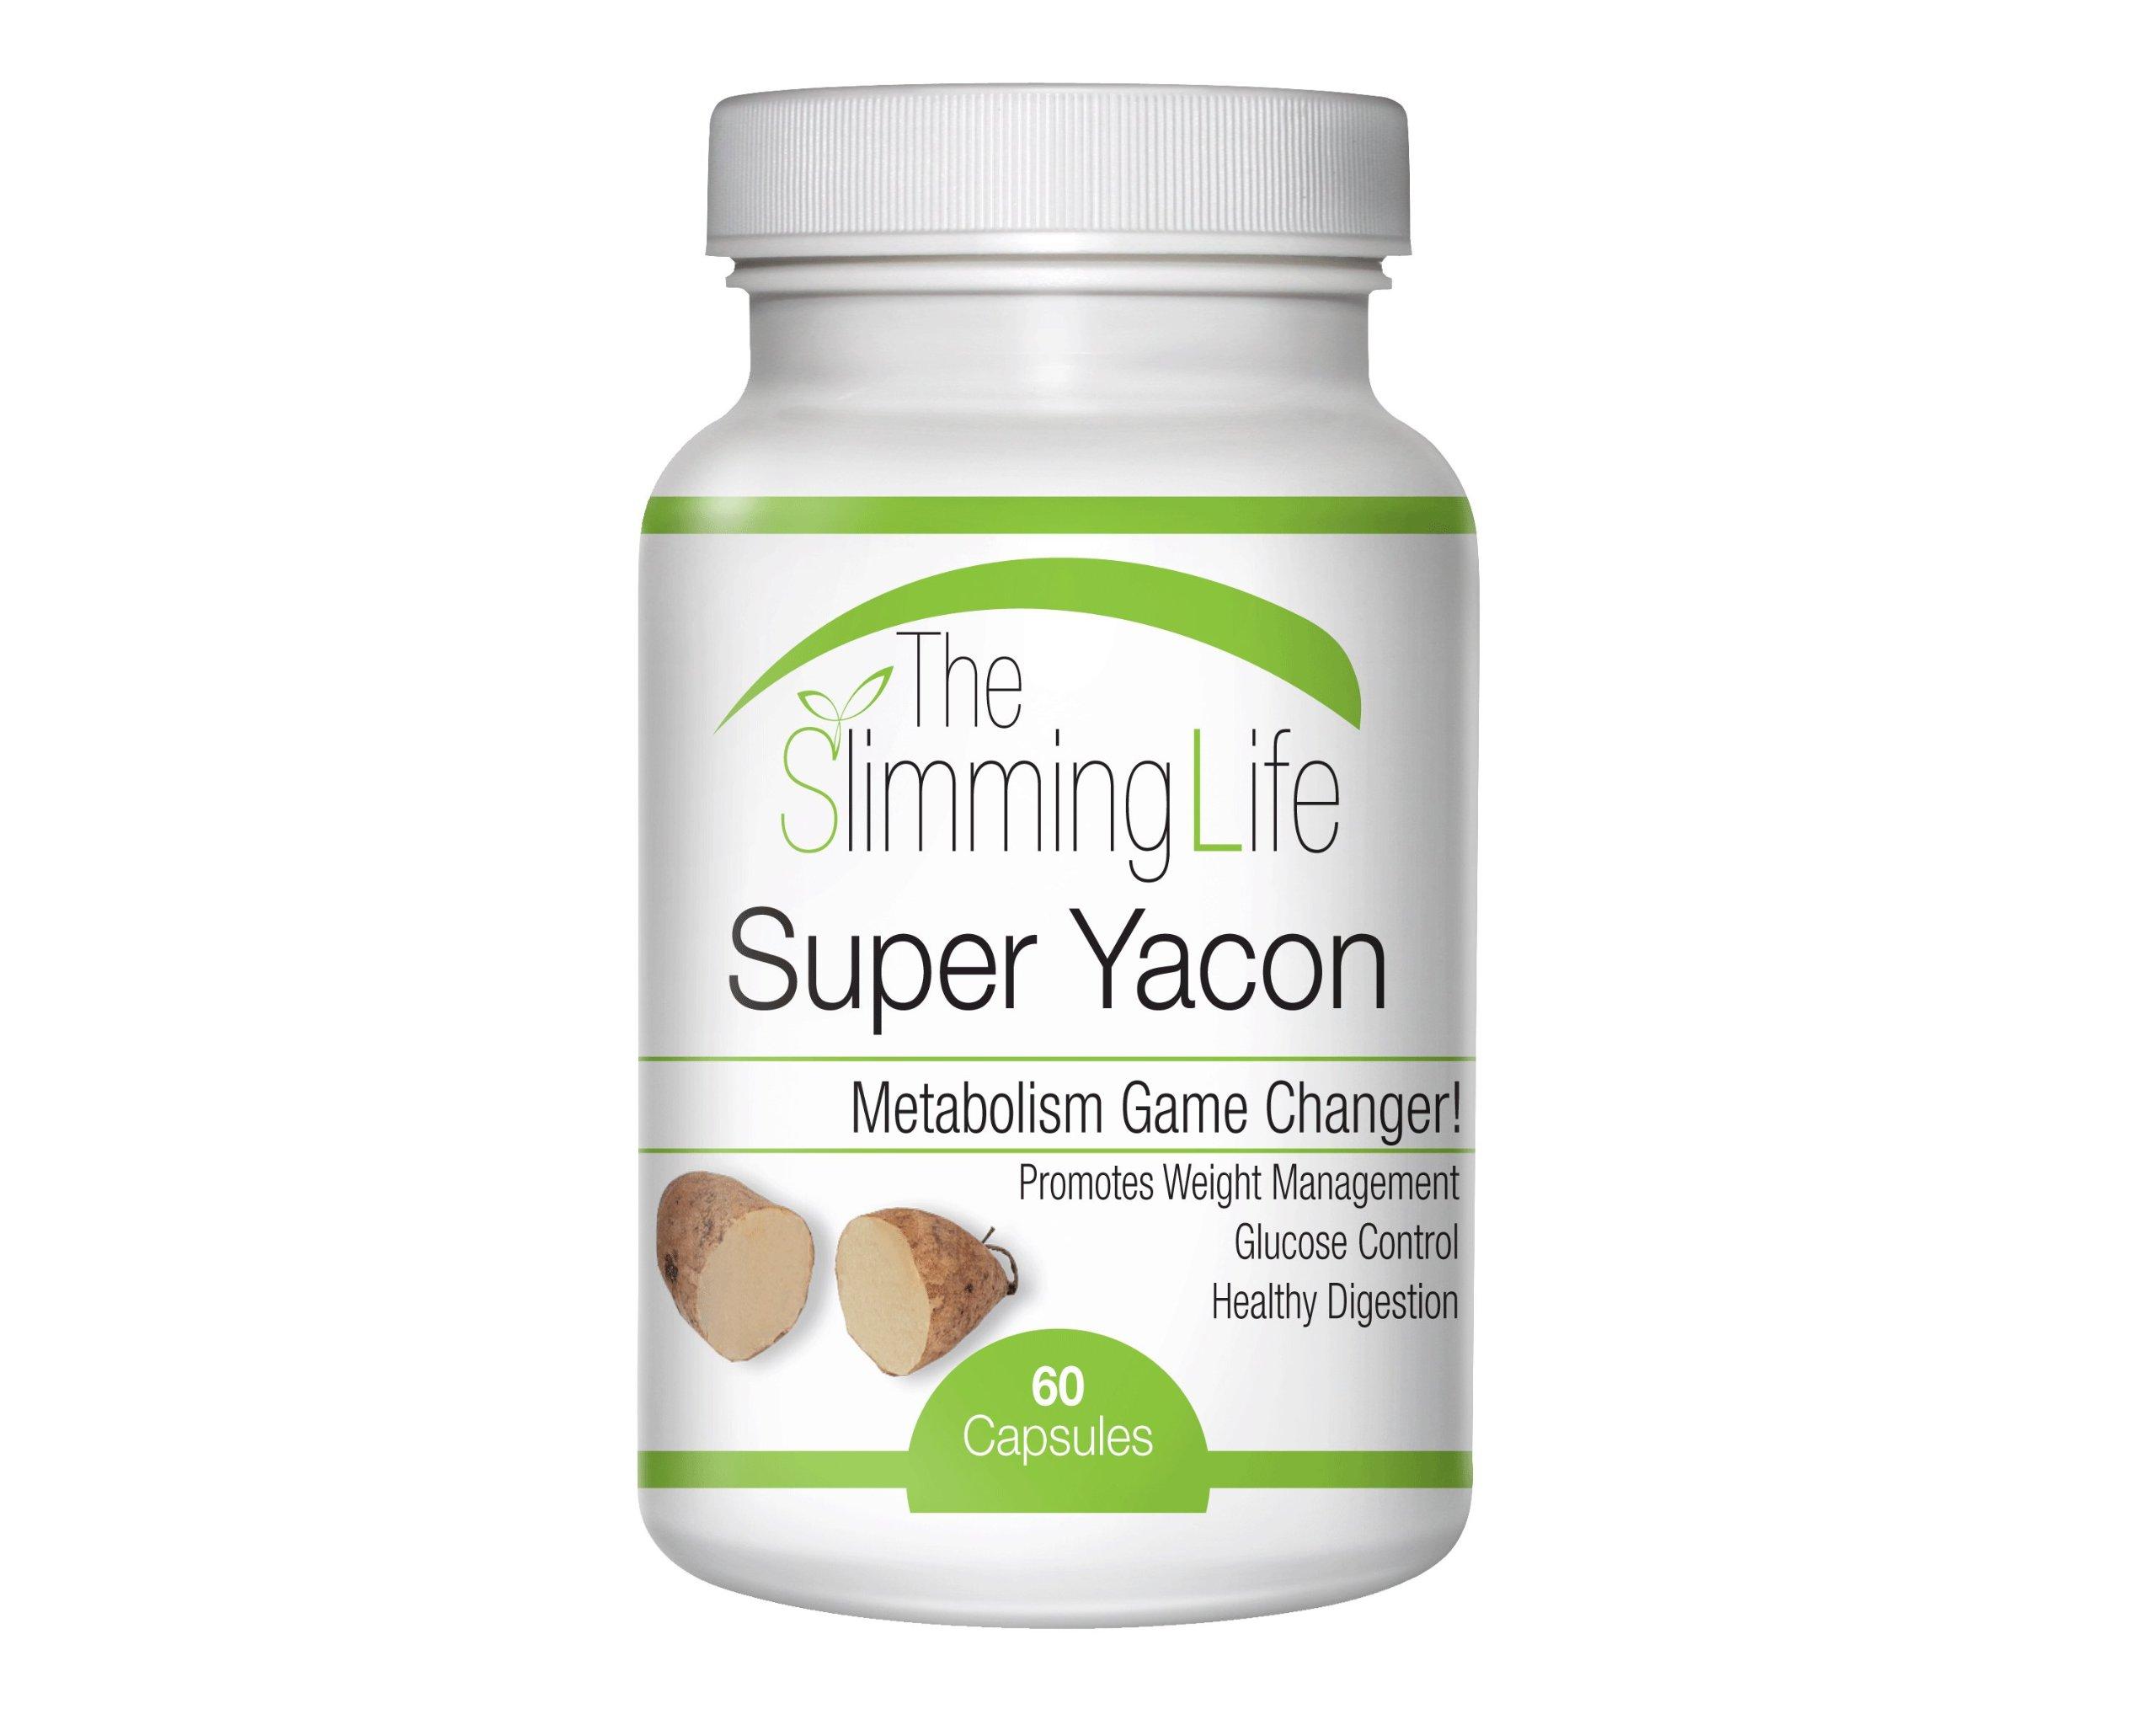 Yacon Pills | 100% Pure Yacon Root | Yacon Capsules | Yacon Organic | Yacon Root | Premium Yacon Root Extract Pills | The Slimming Life